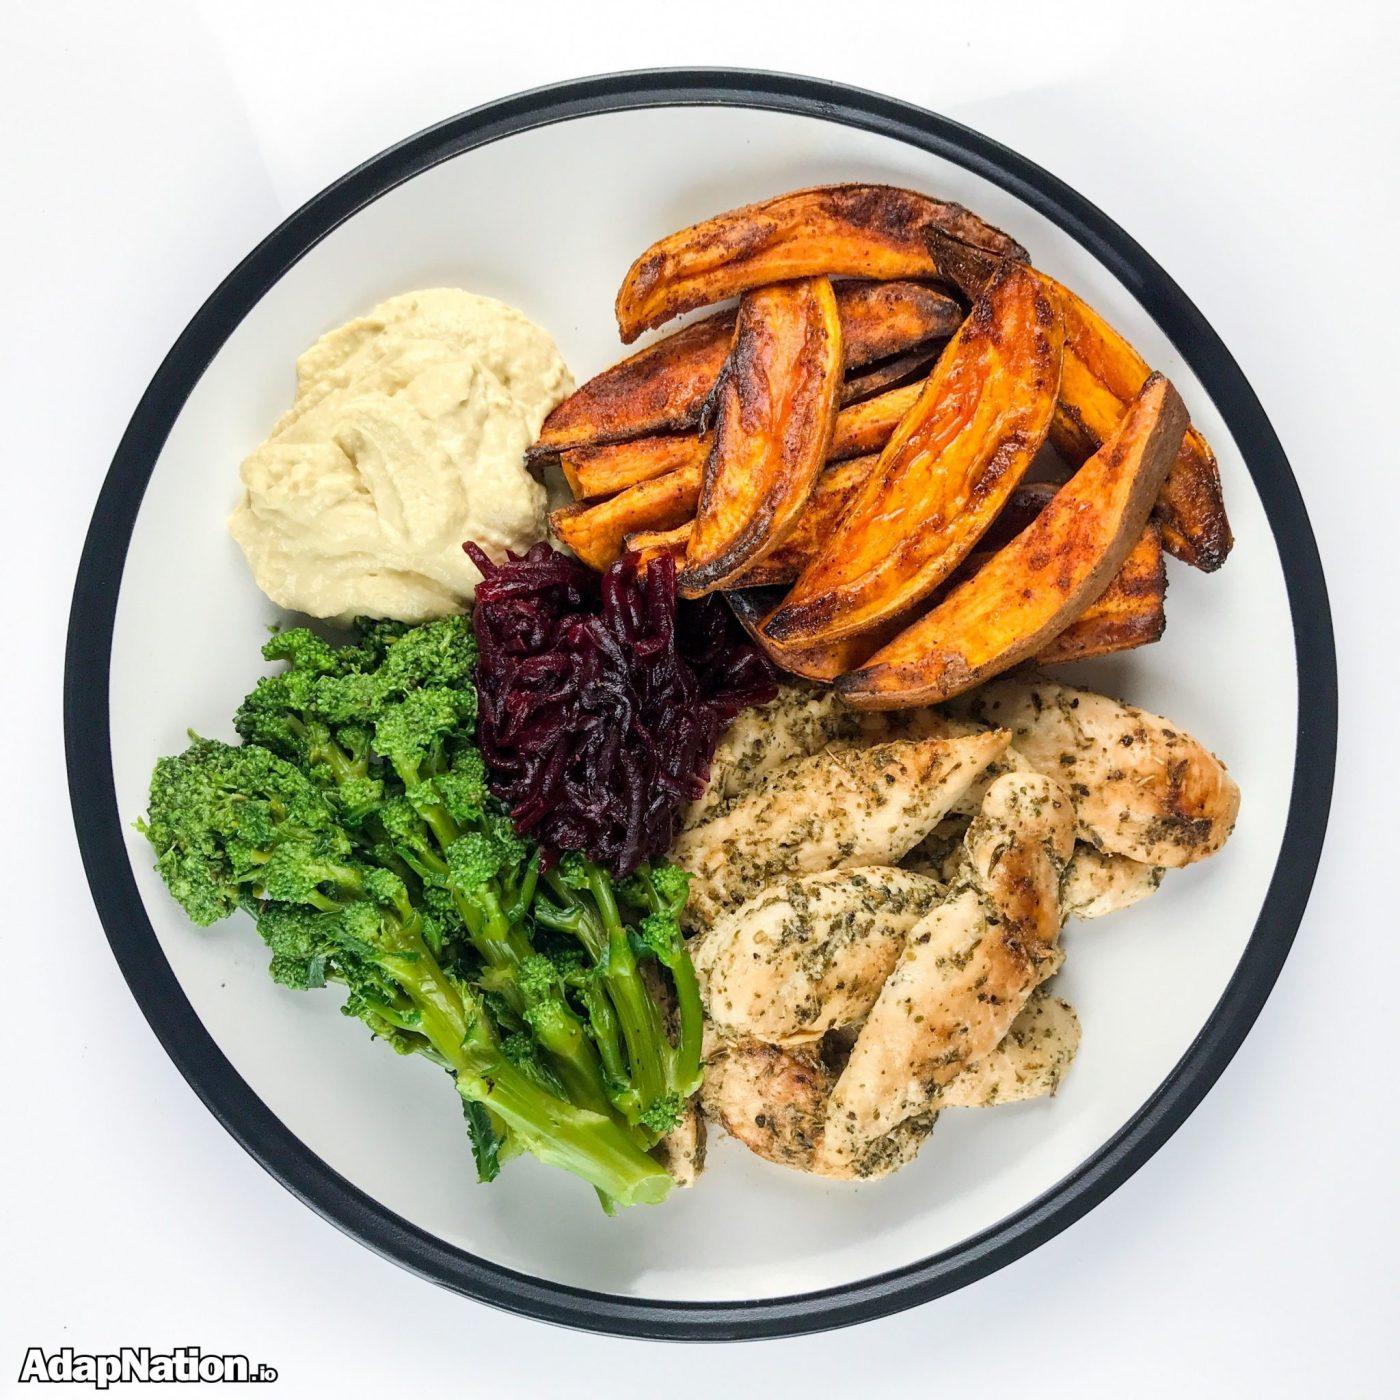 Chicken, Sweet Potato Wedges, Hummus & Veg